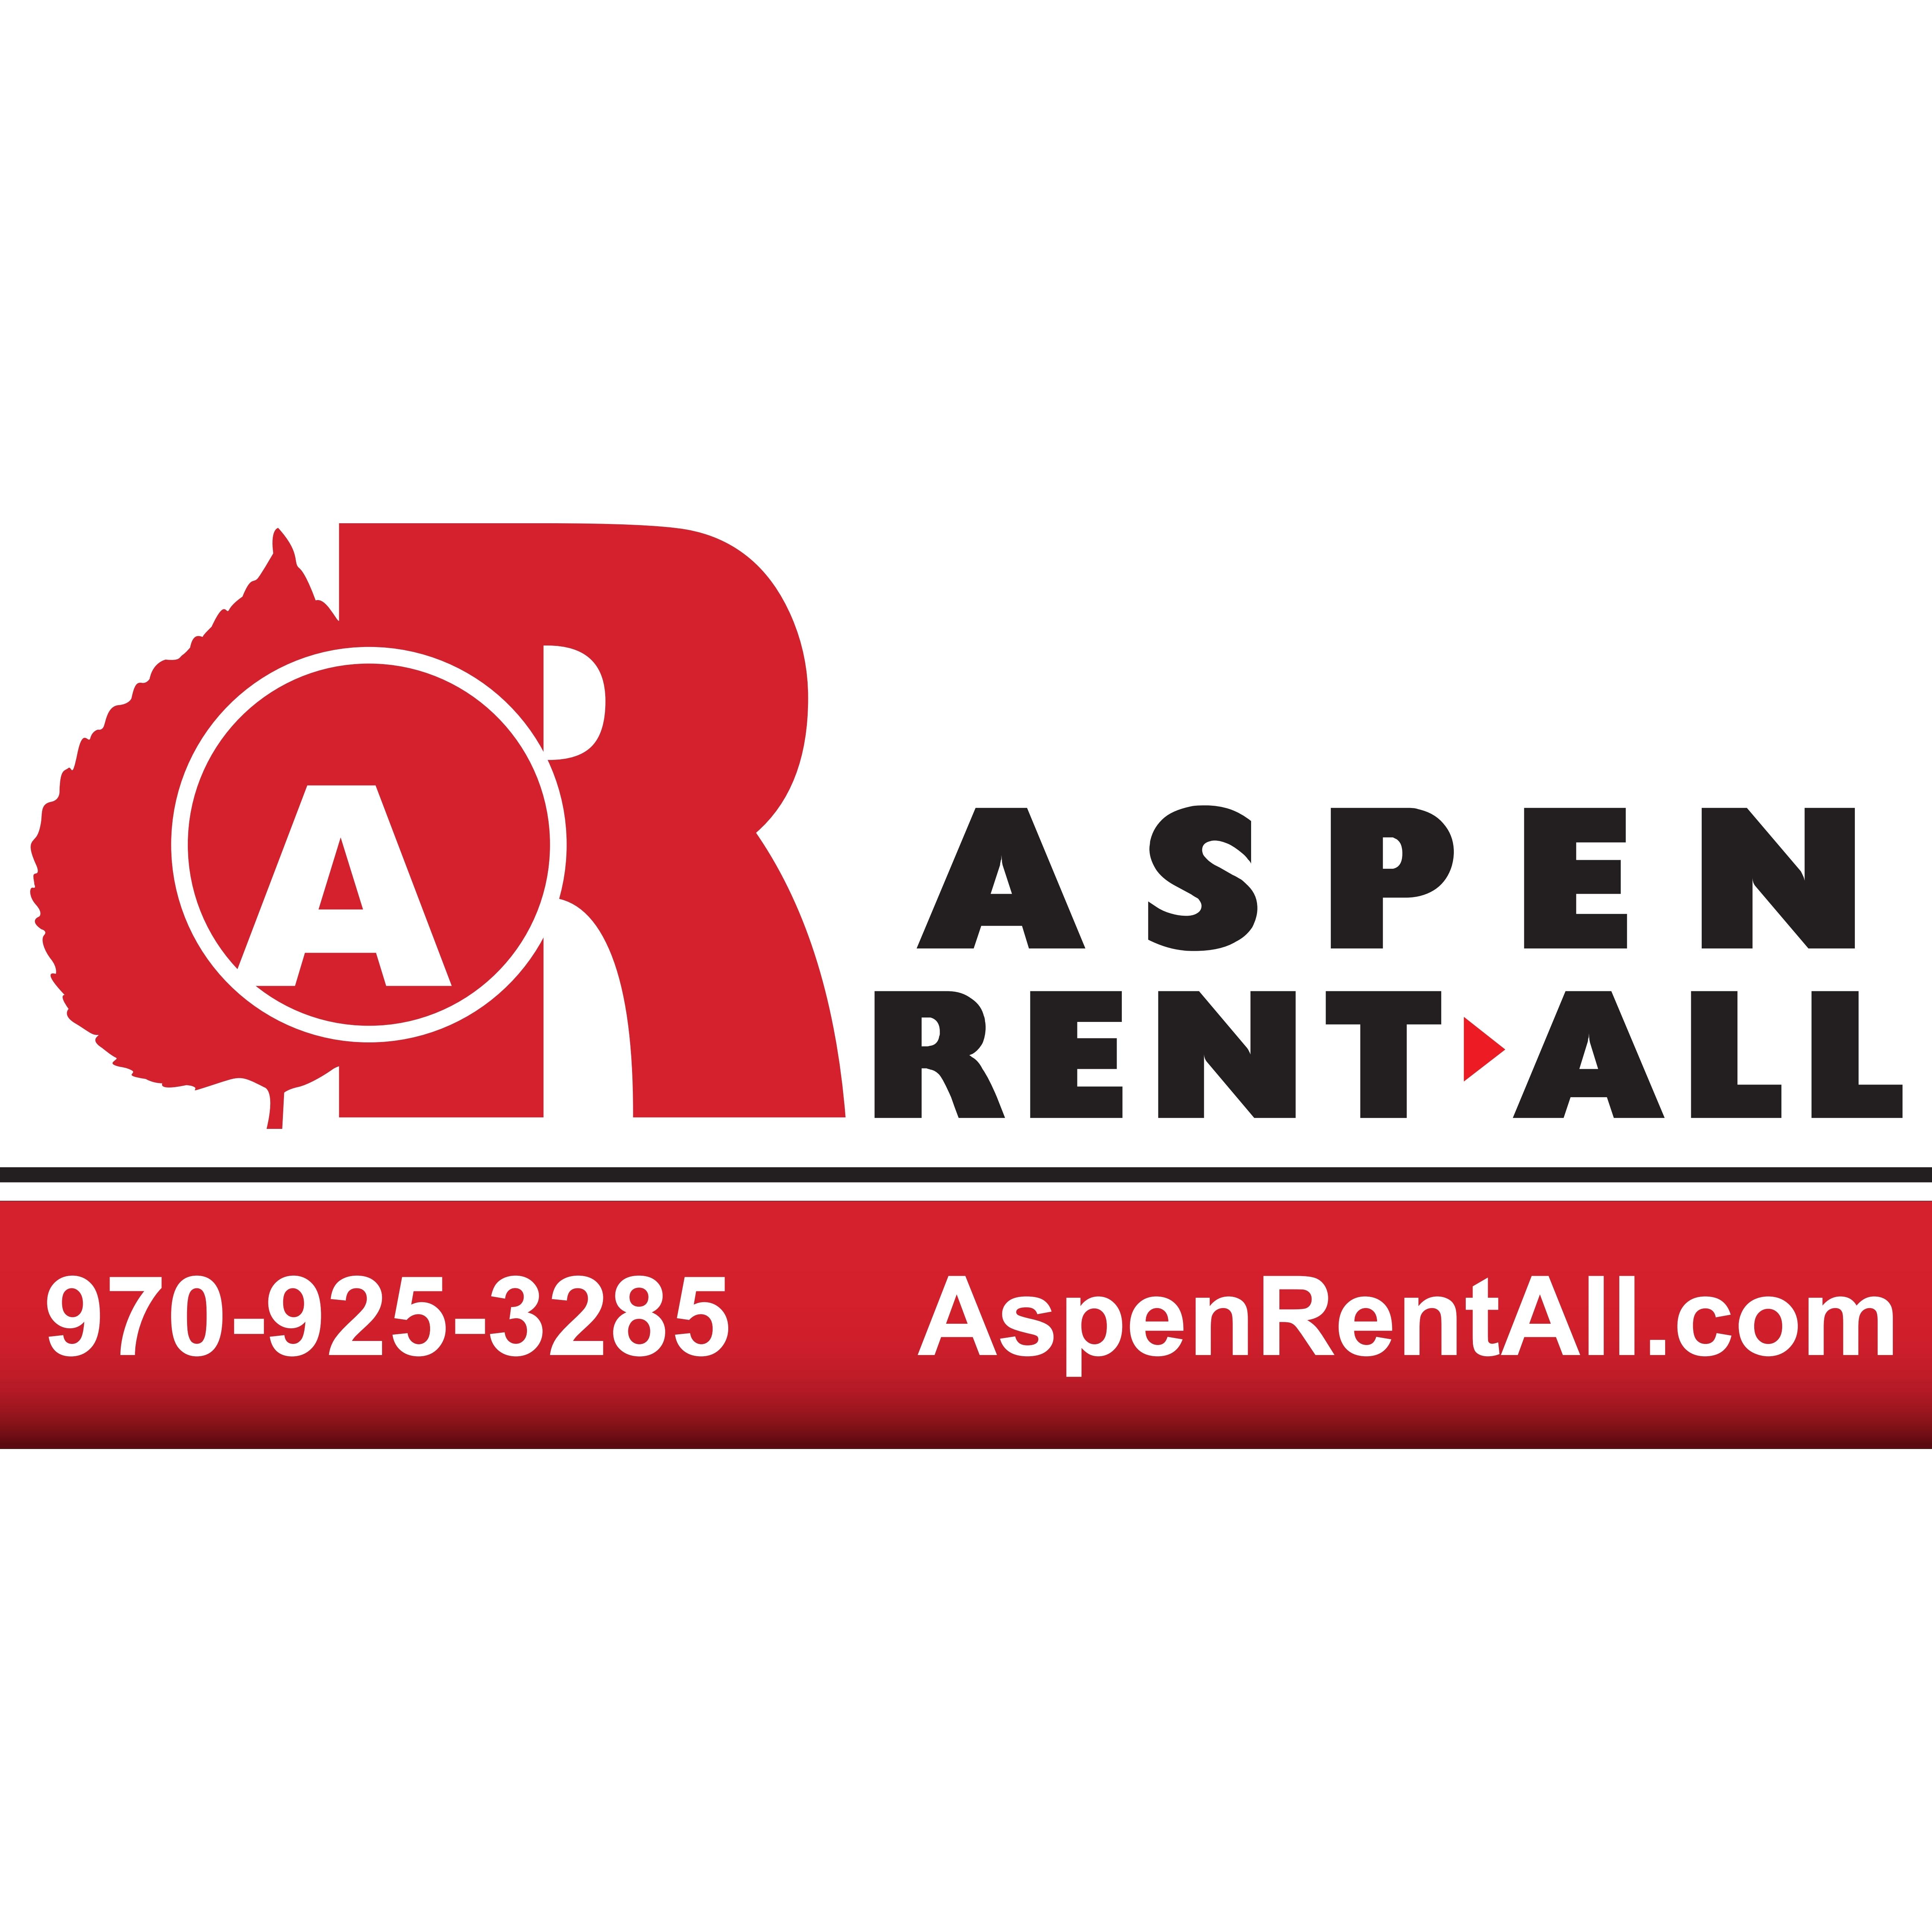 Aspen Rent All Inc - Basalt, CO - Lawn Care & Grounds Maintenance